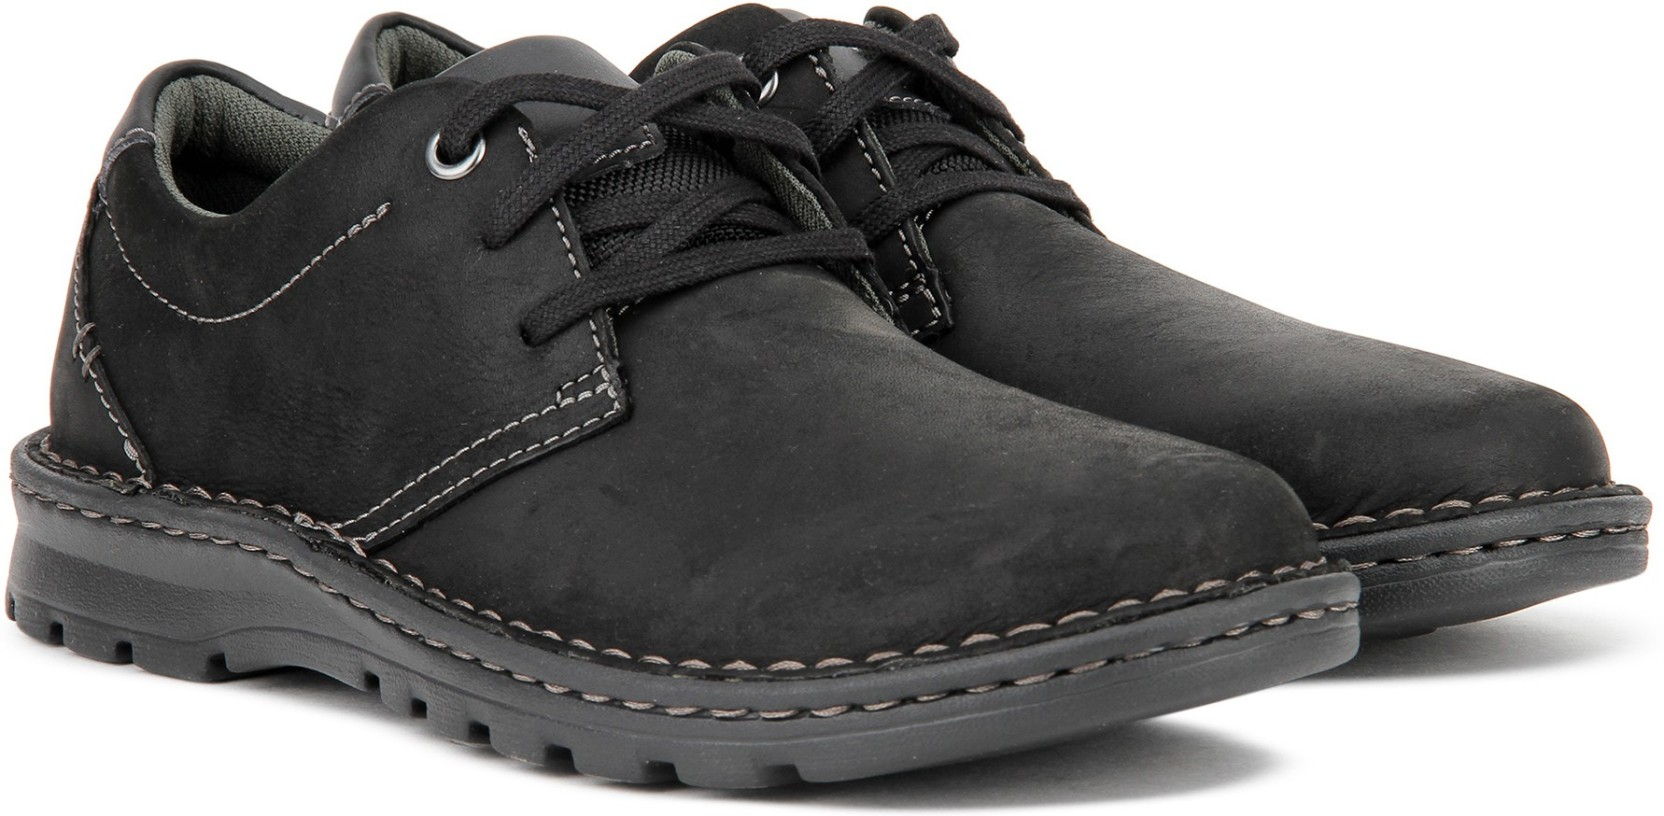 94ce3915edd Clarks Vanek Plain Casual For Men - Buy Black Leather Color Clarks ...